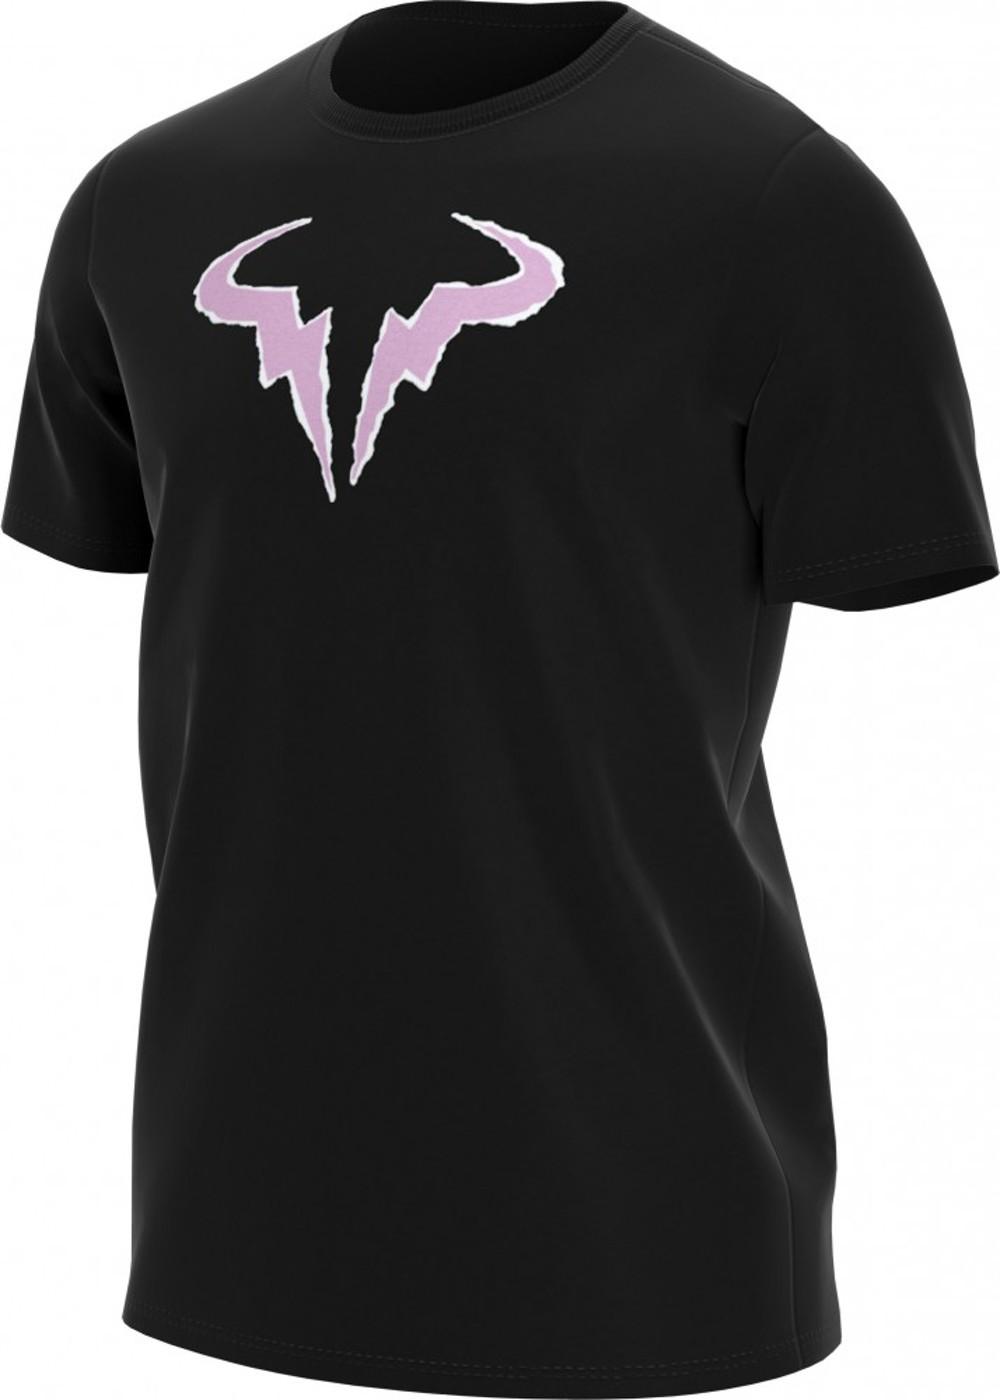 NIKE Rafa Tennis T-Shirt - Herren